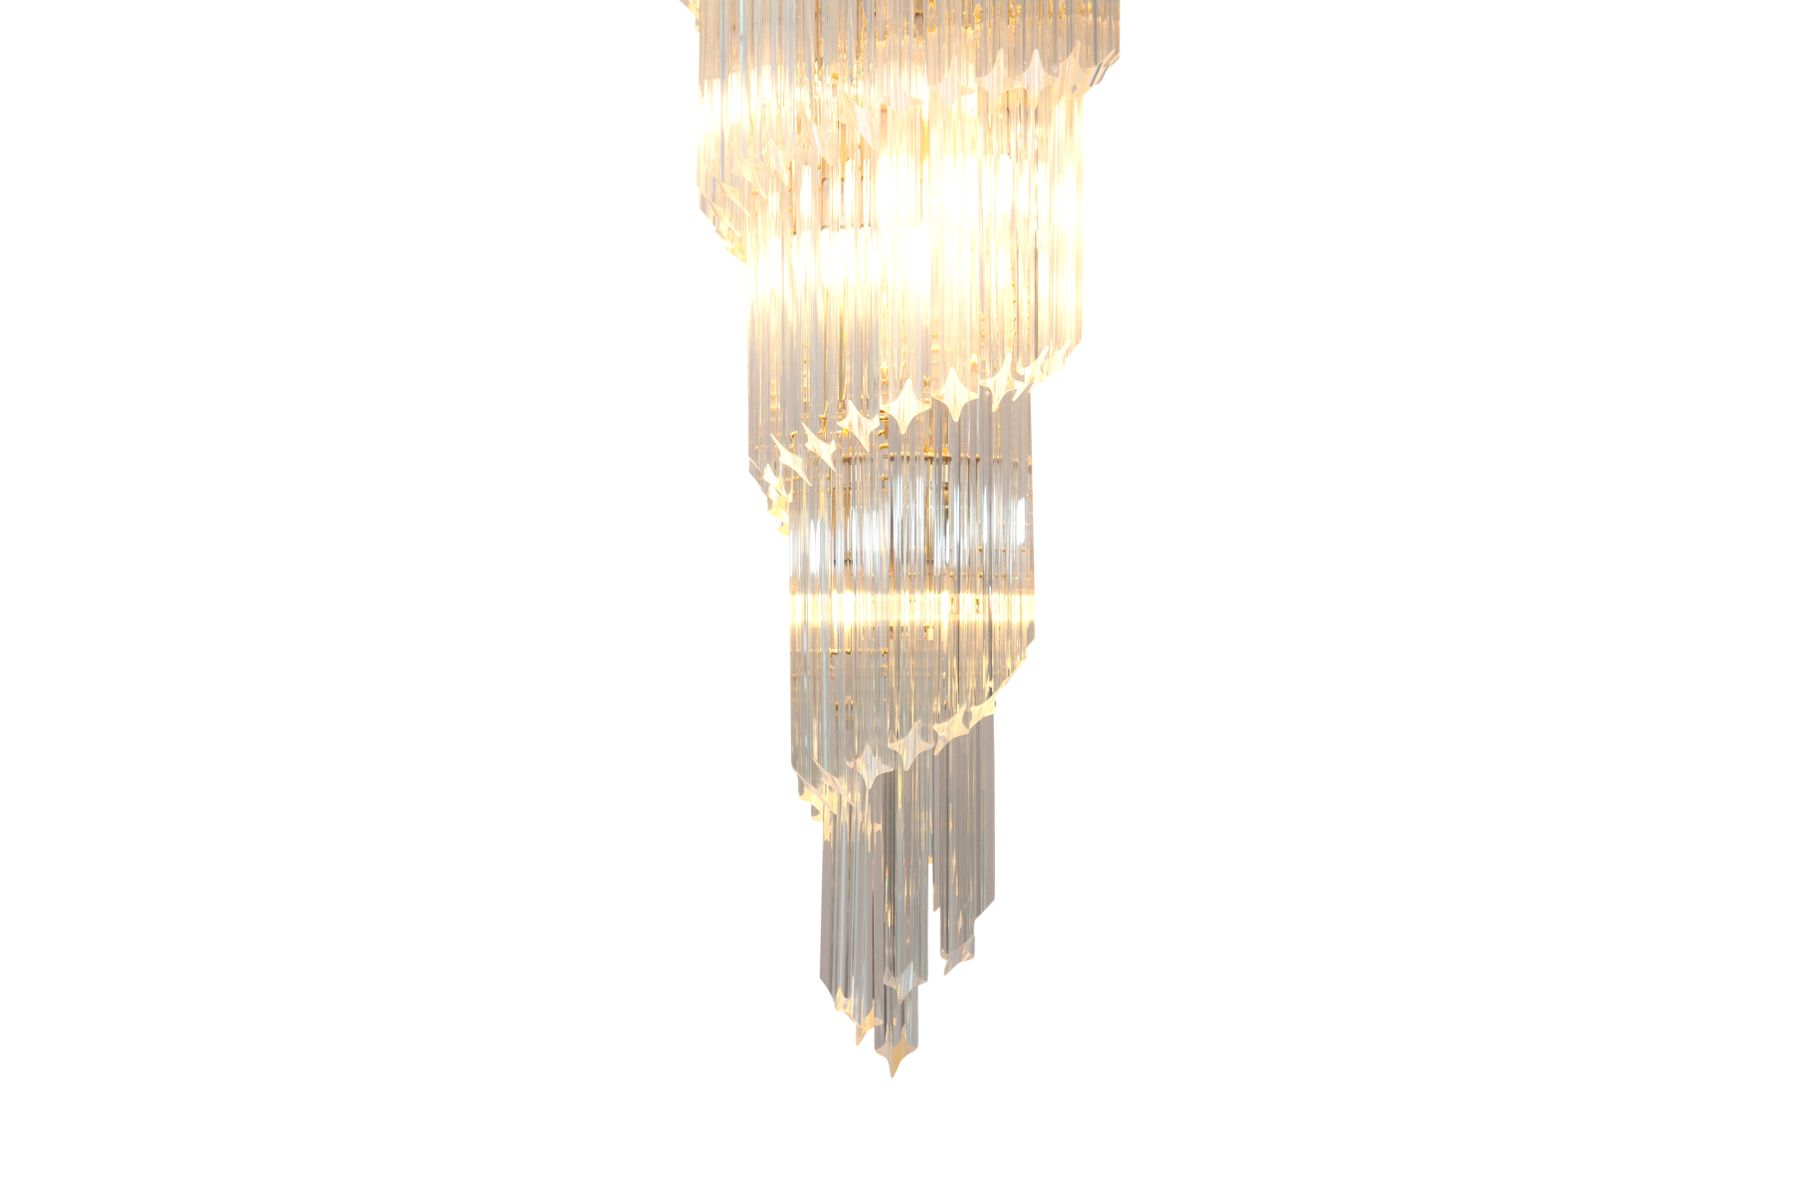 Spiraling chandelier in murano crystal glass from venini 1960s for spiraling chandelier in murano crystal glass from venini 1960s arubaitofo Gallery